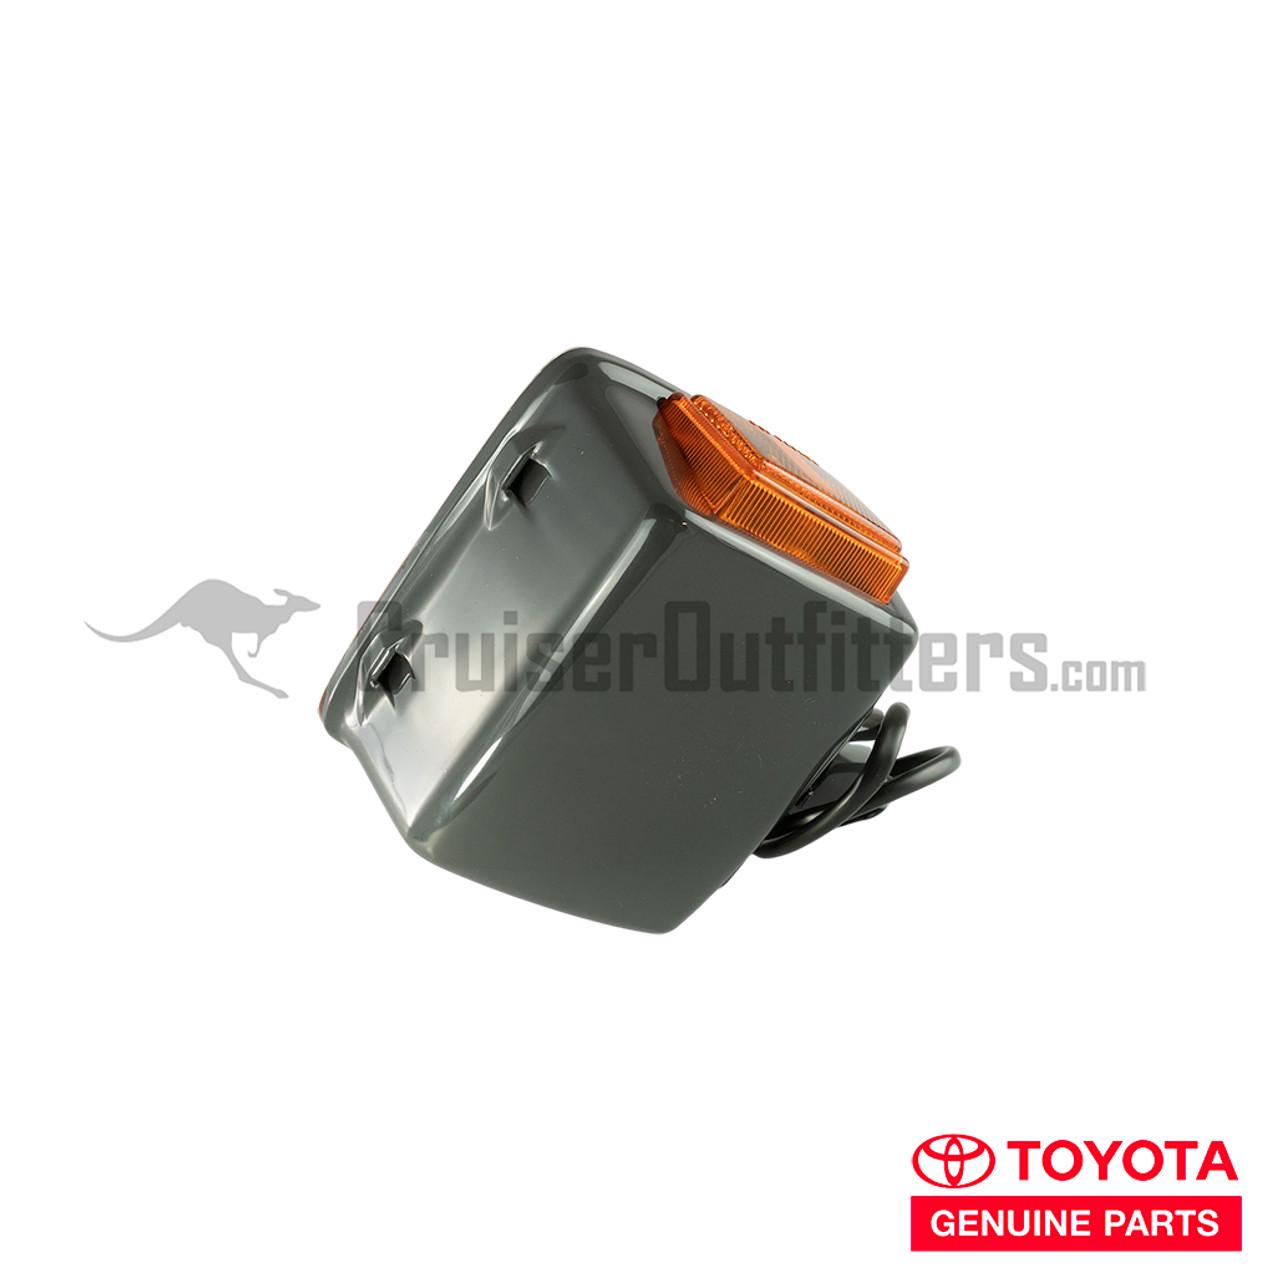 Front Turn Signal Assembly - OEM Toyota - Fits 4x Series RH (LT69035ROEM)